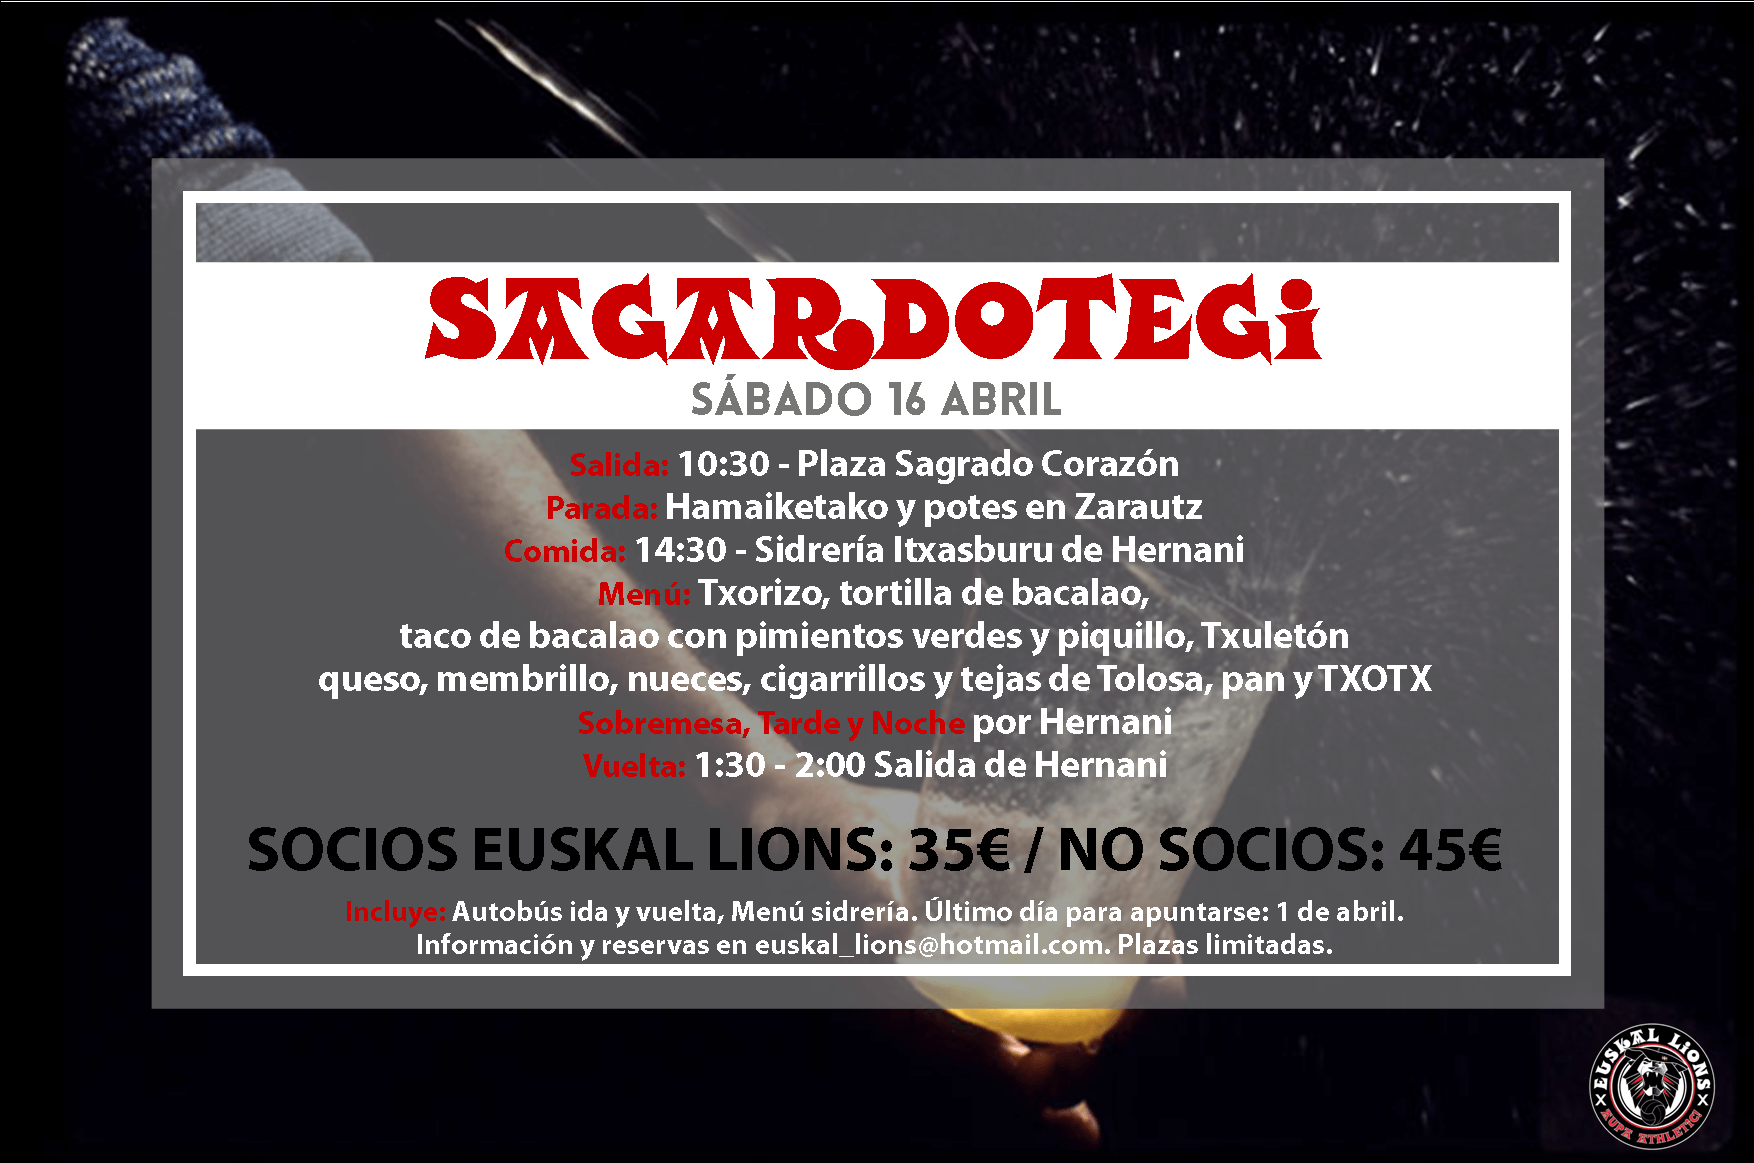 Sagardotegi 2016 Cartel